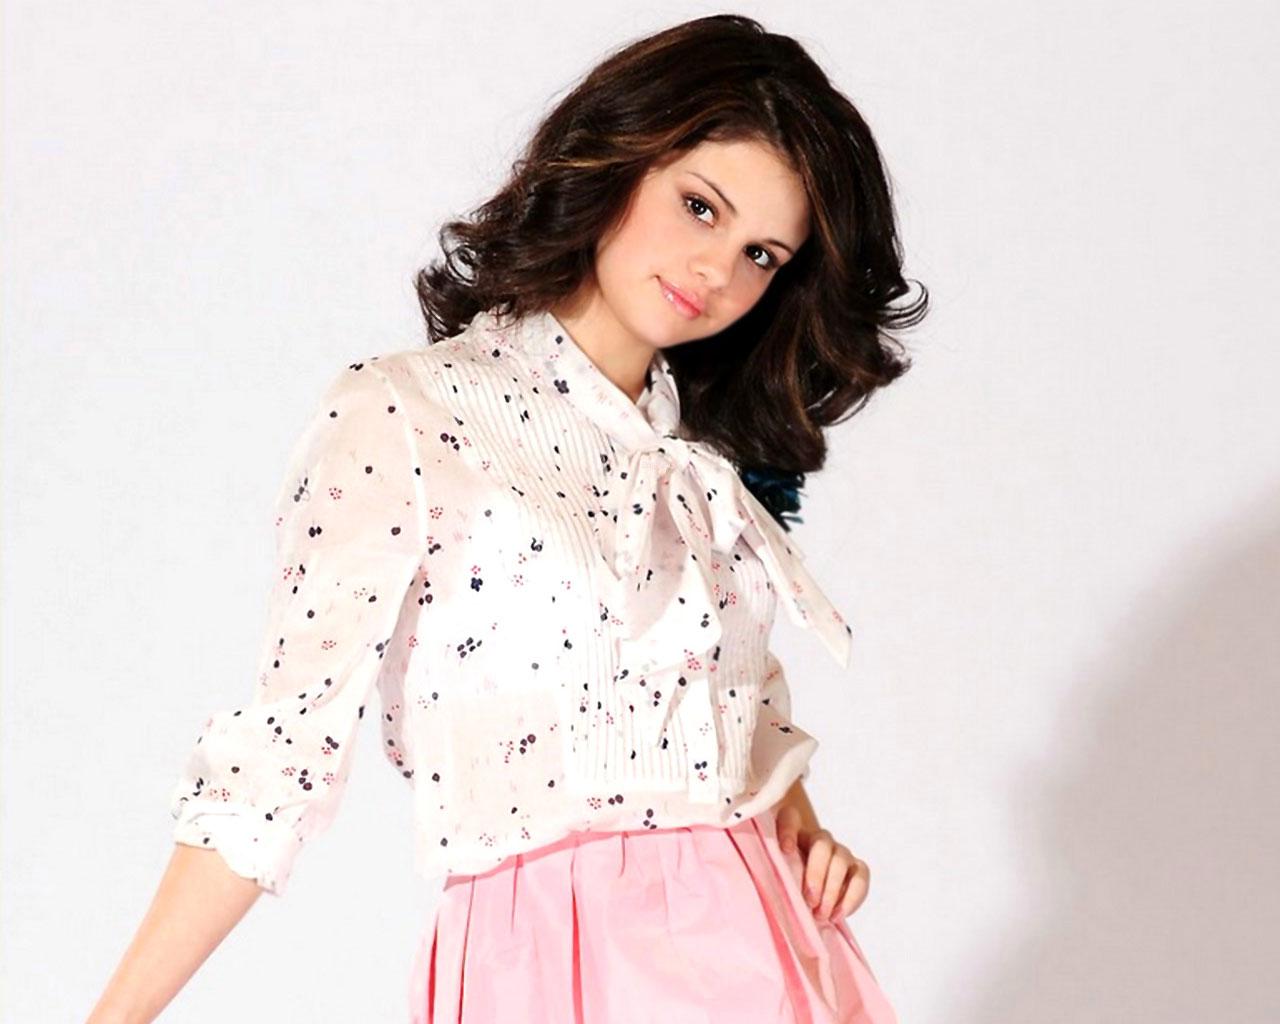 HD Wallpapers Selena Gomez 67